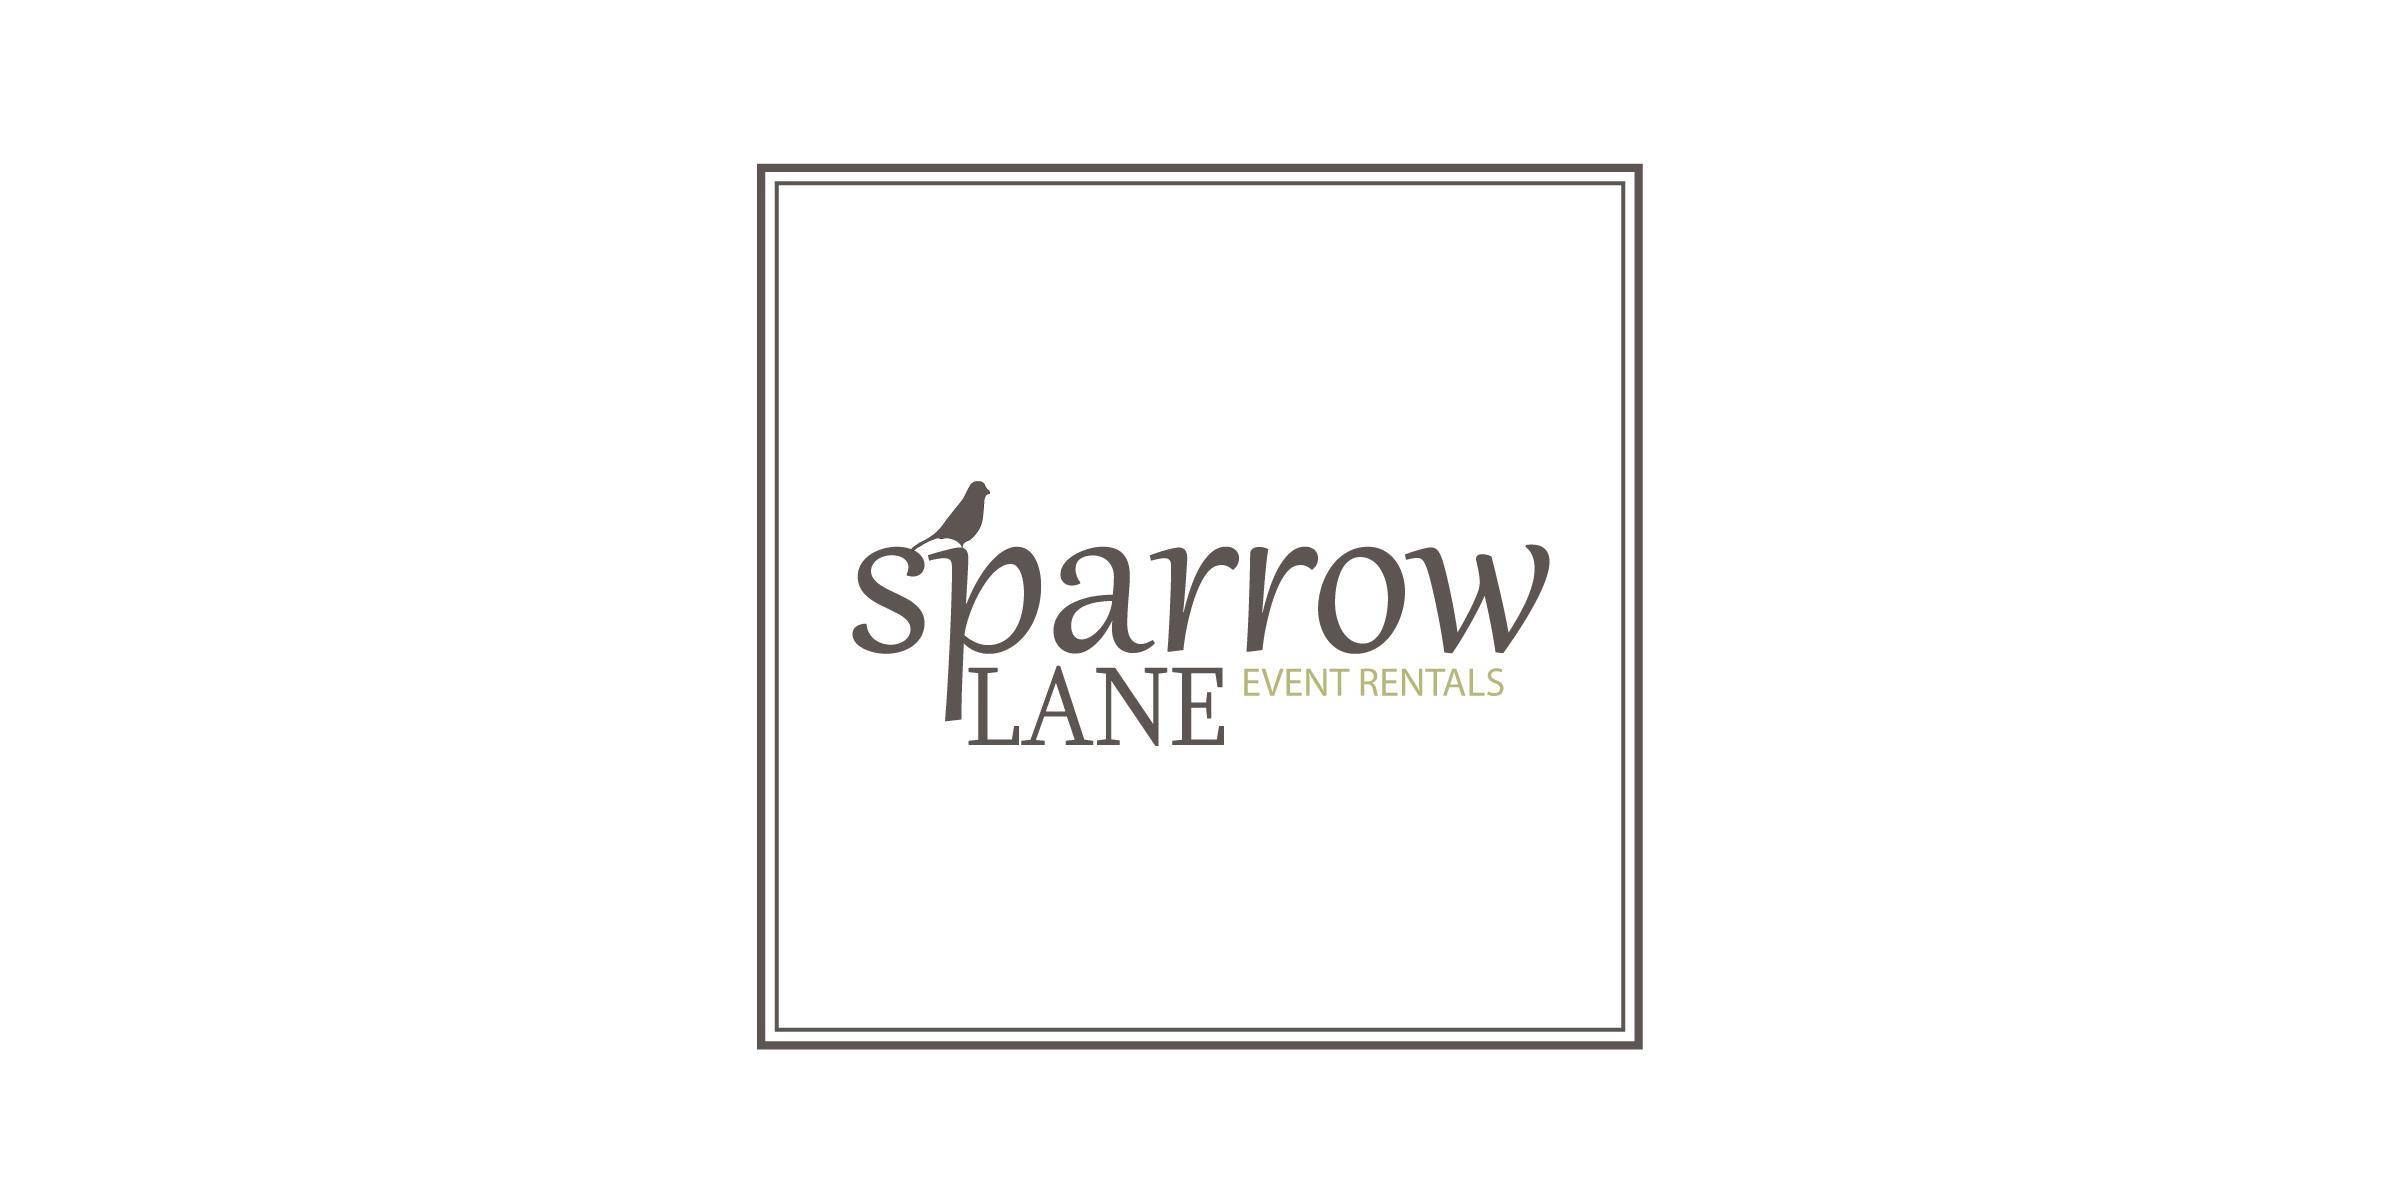 SparrowLane.jpg